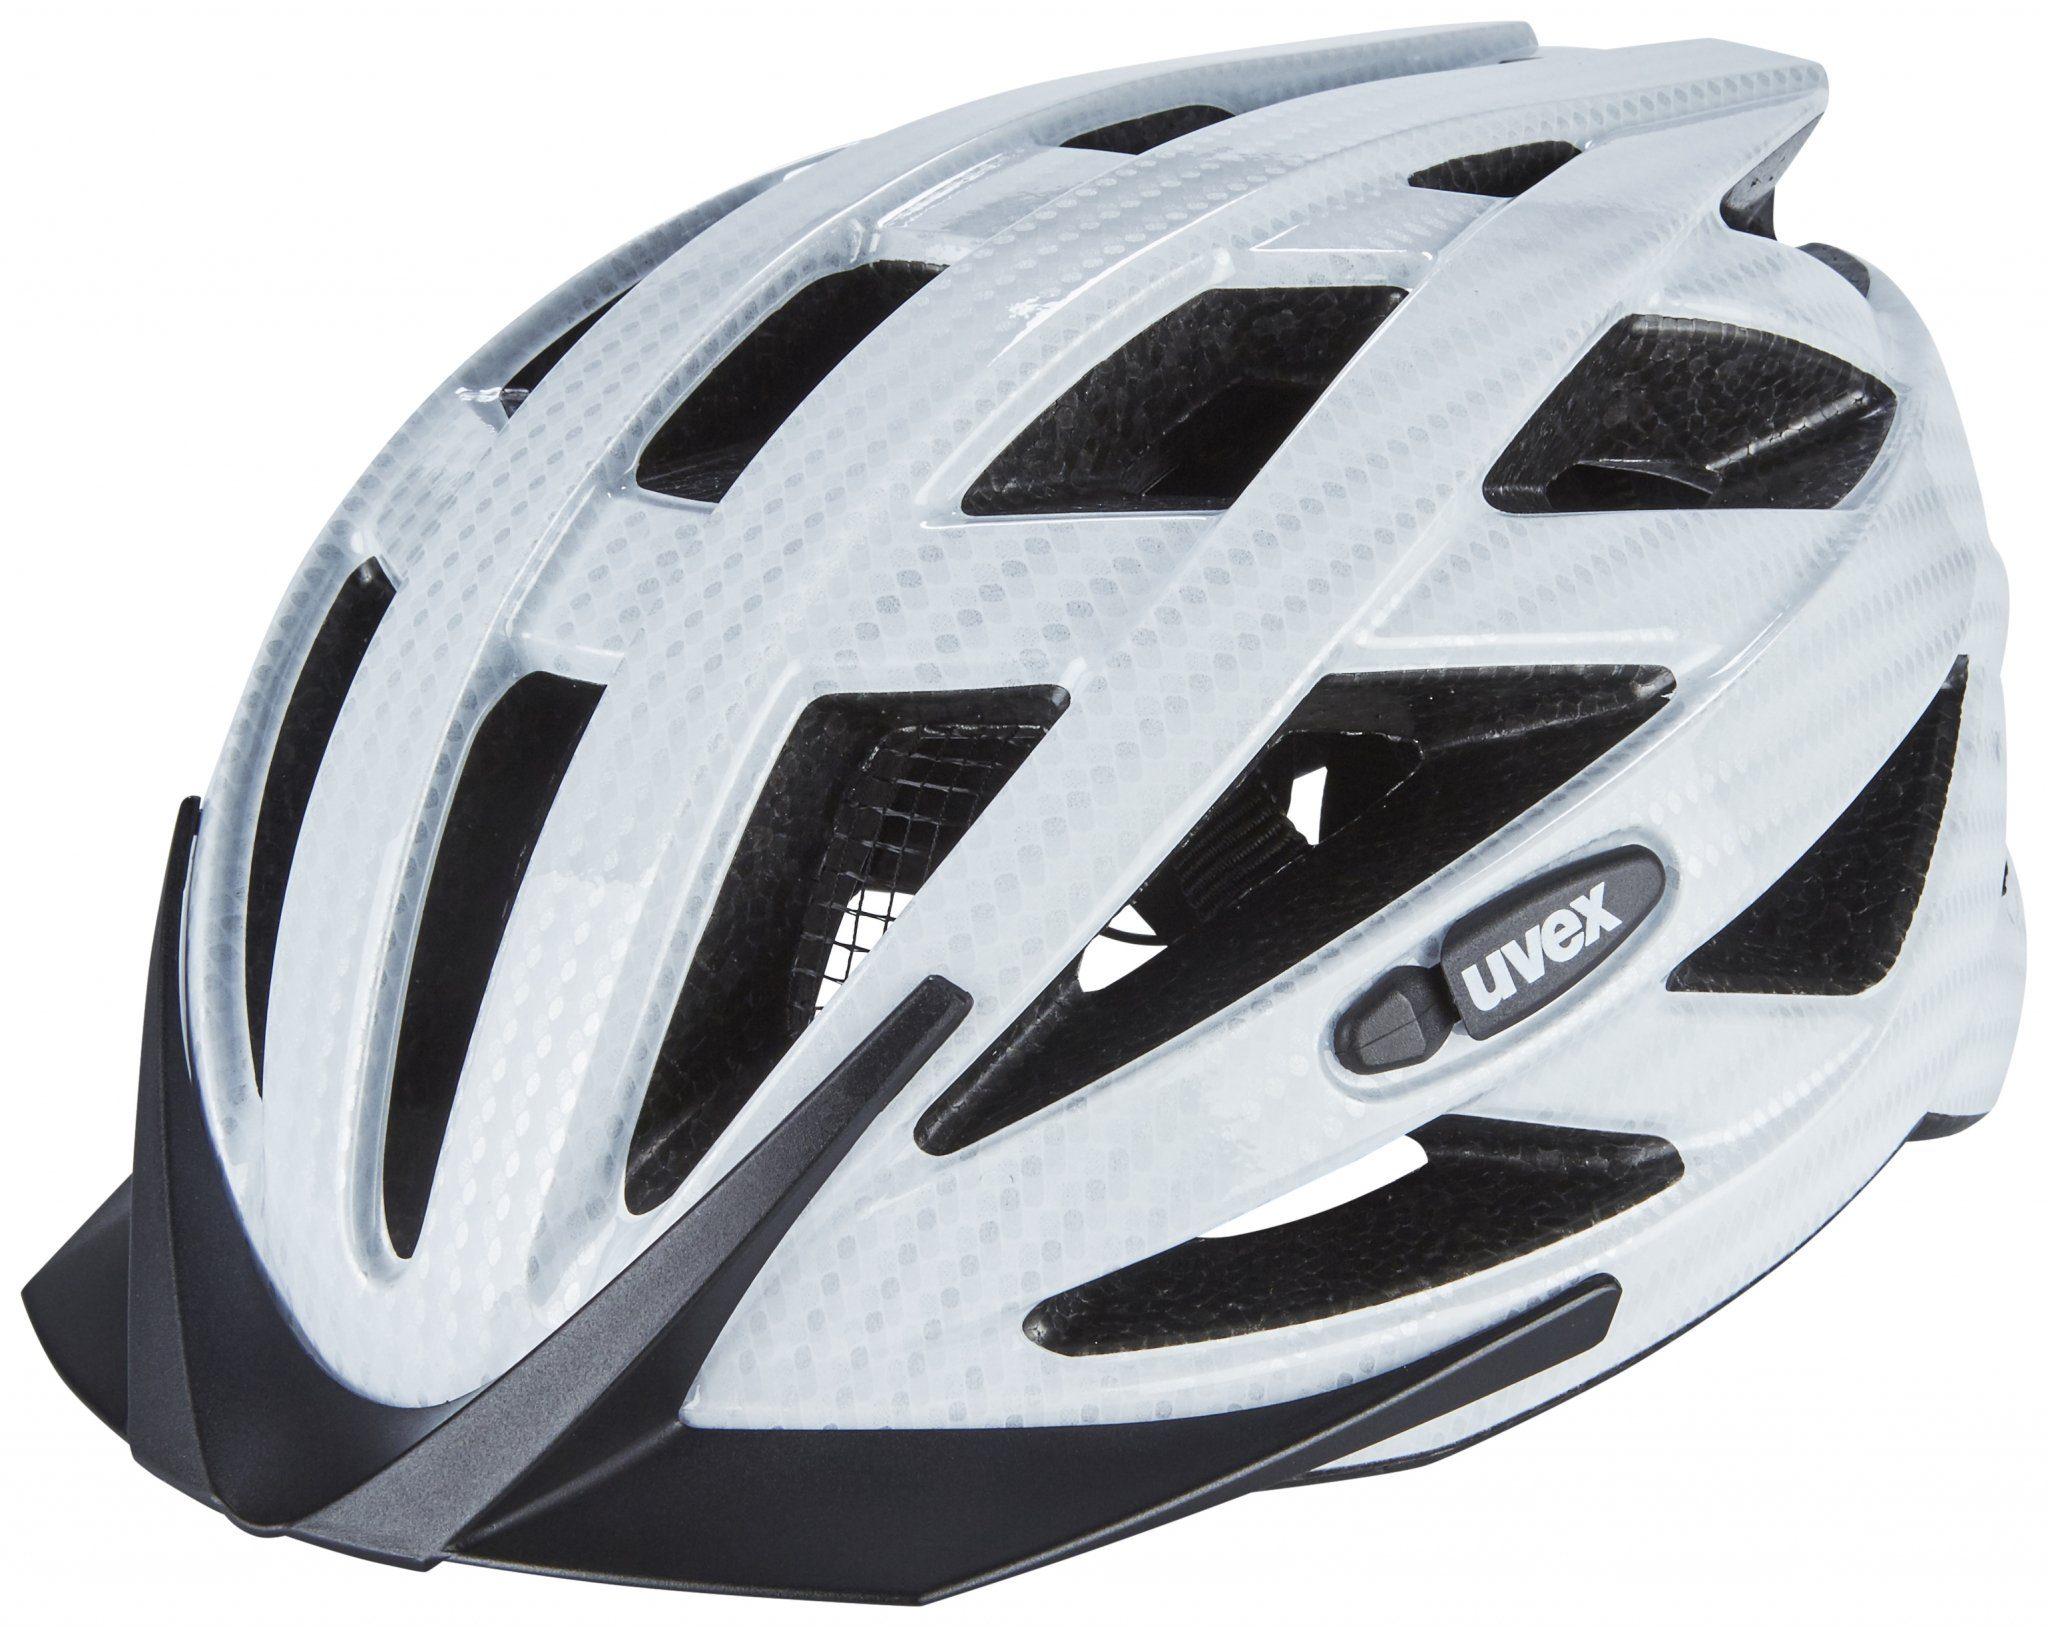 UVEX Fahrradhelm »i-vo c Helm«